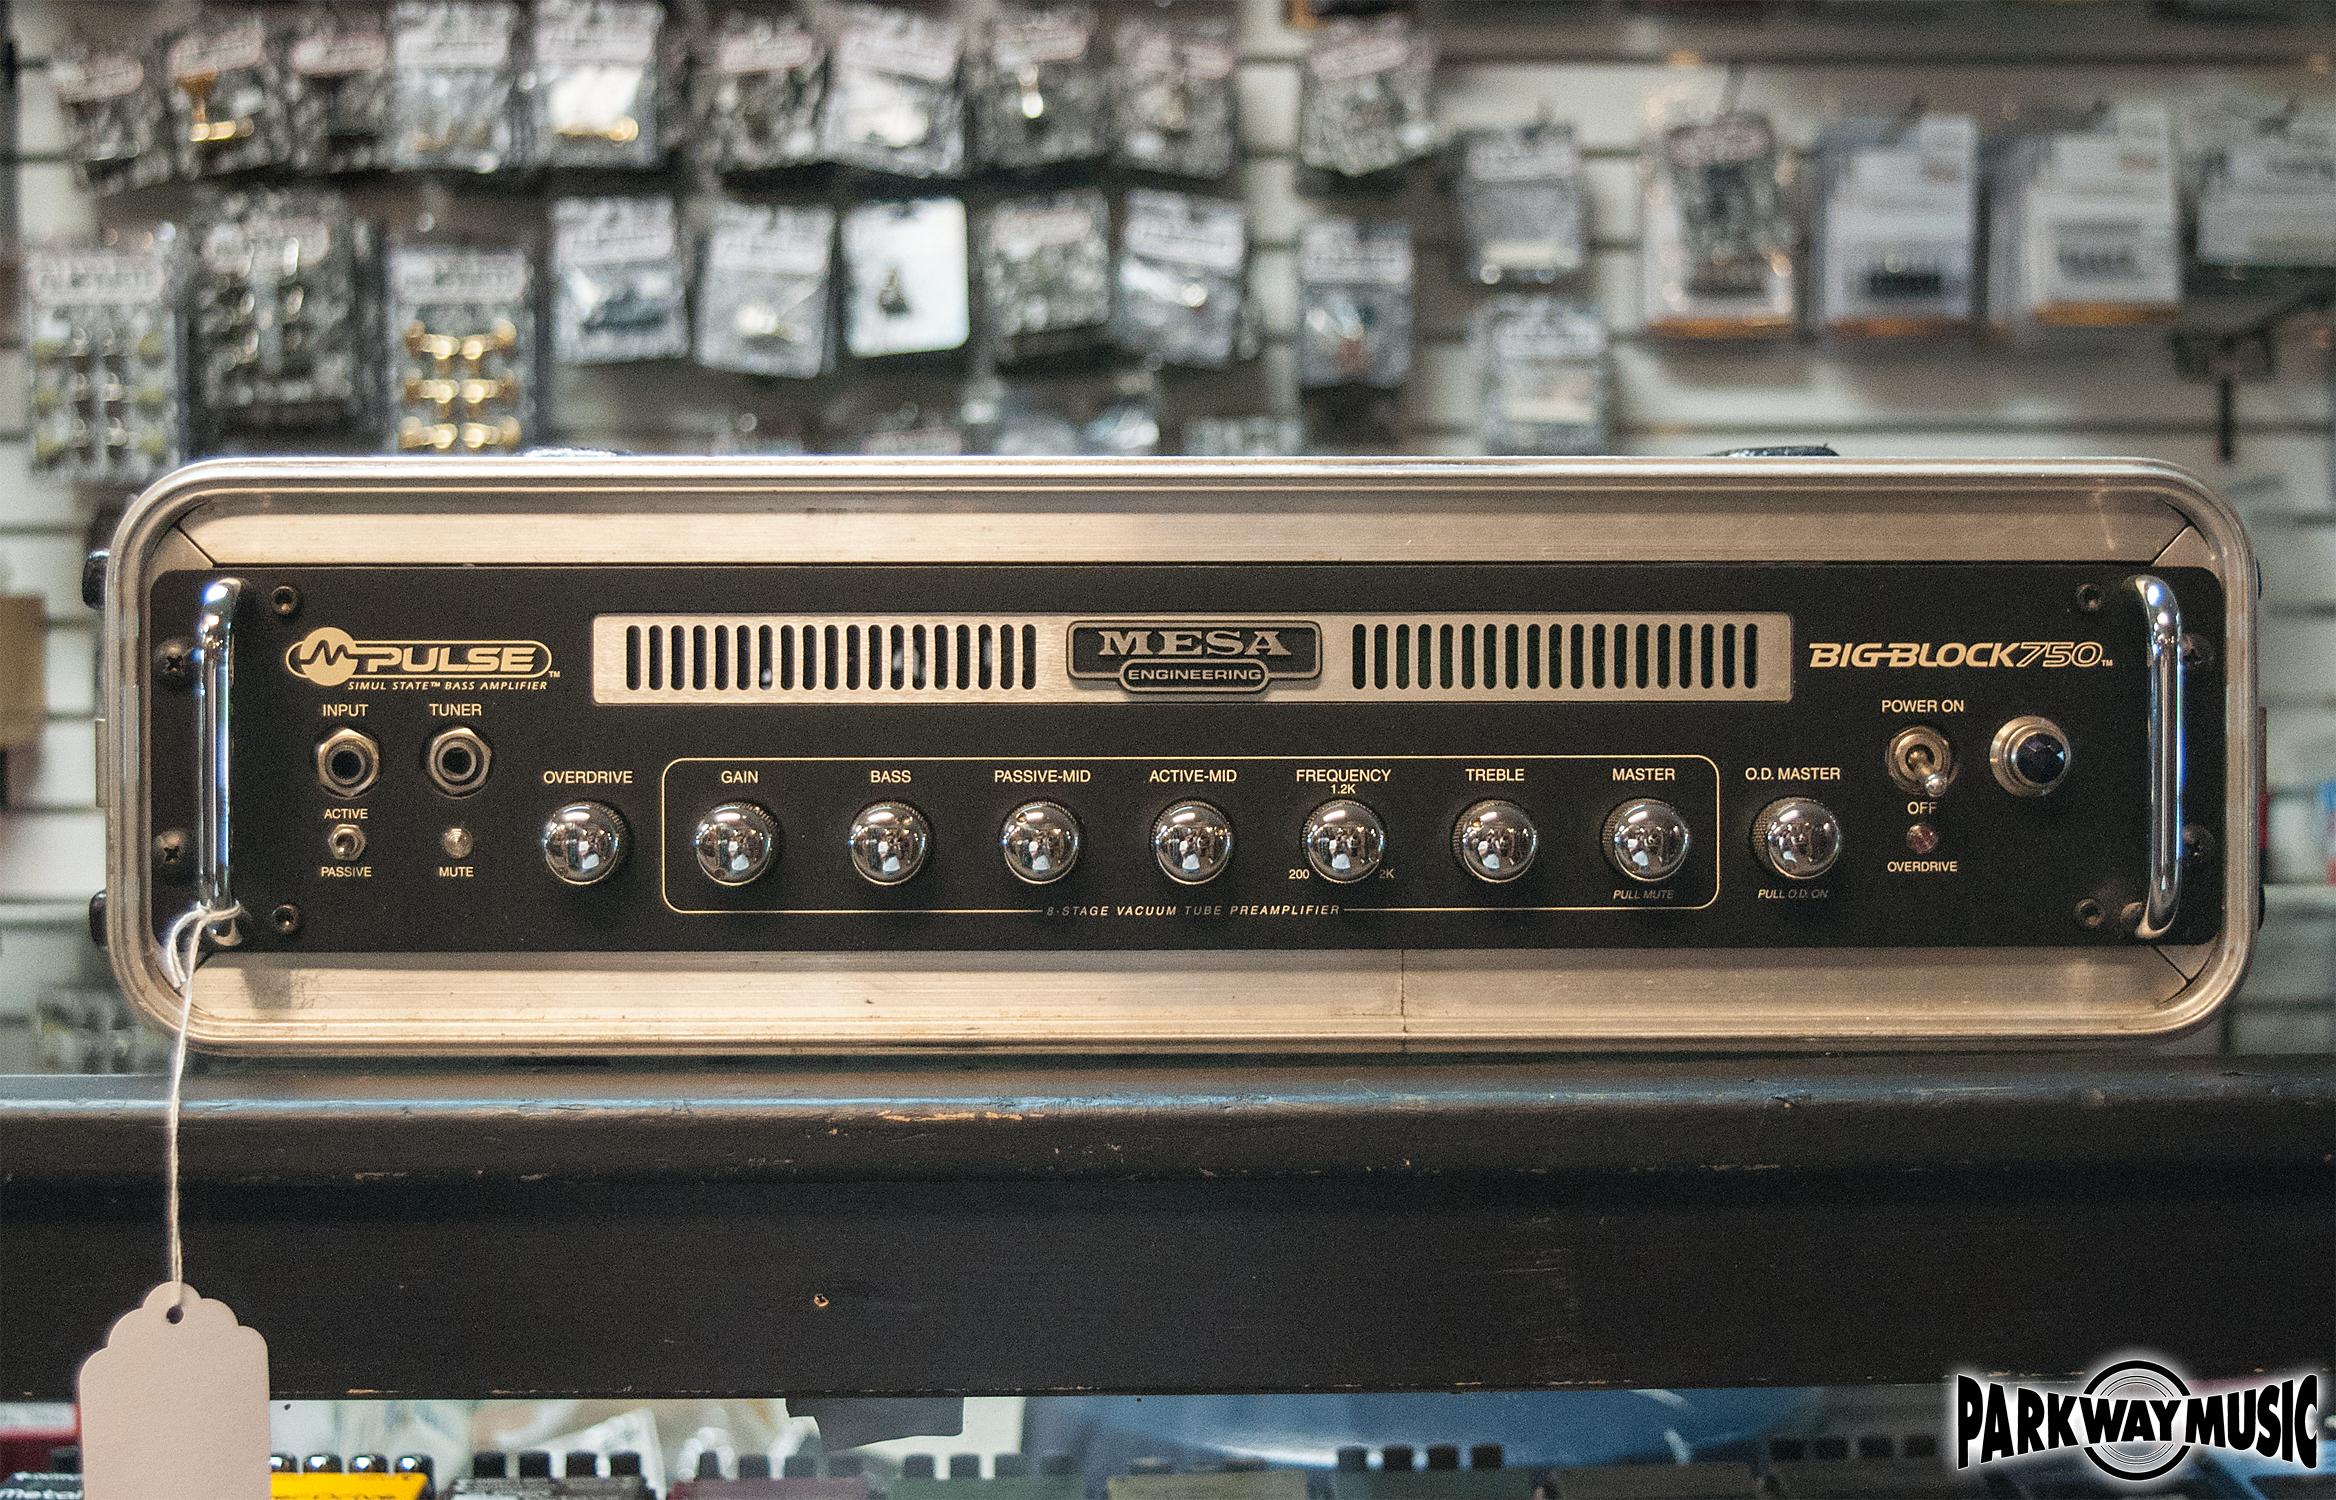 Mesa Boogie Big Block 750 Head (USED)